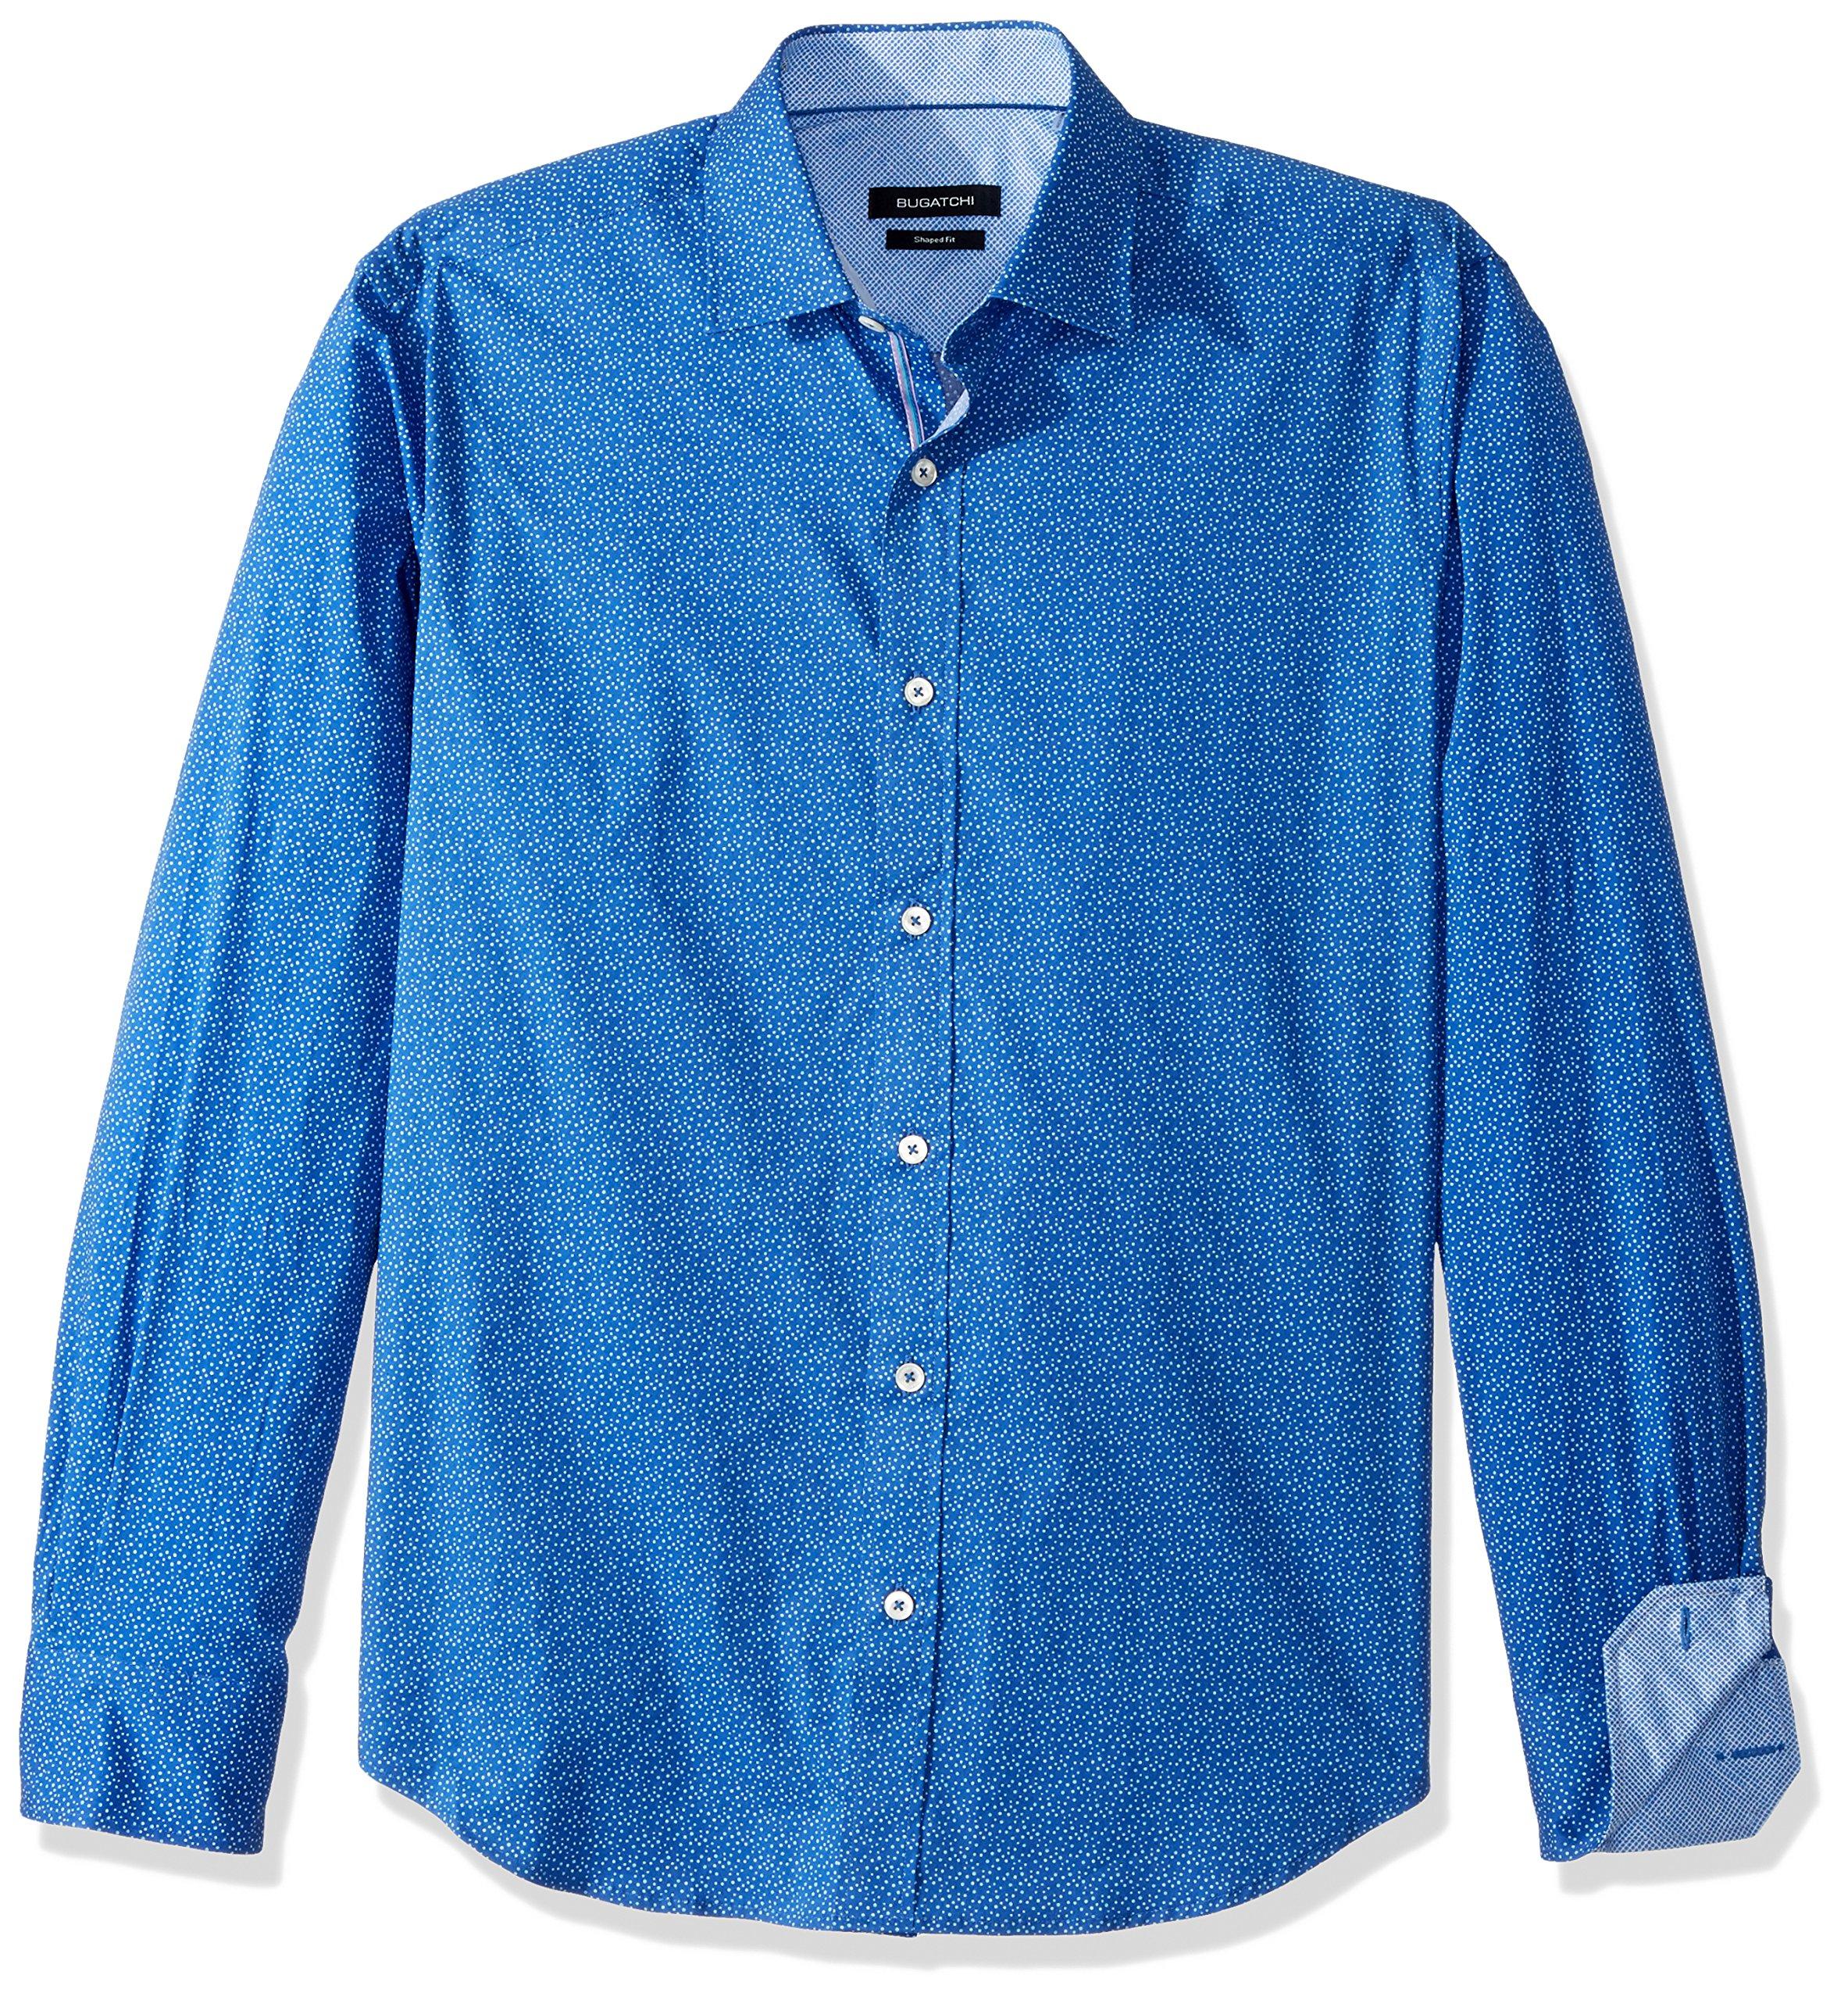 BUGATCHI Men's Cotton Blend Slim Fit Long Sleeve Shirt, Royal, M